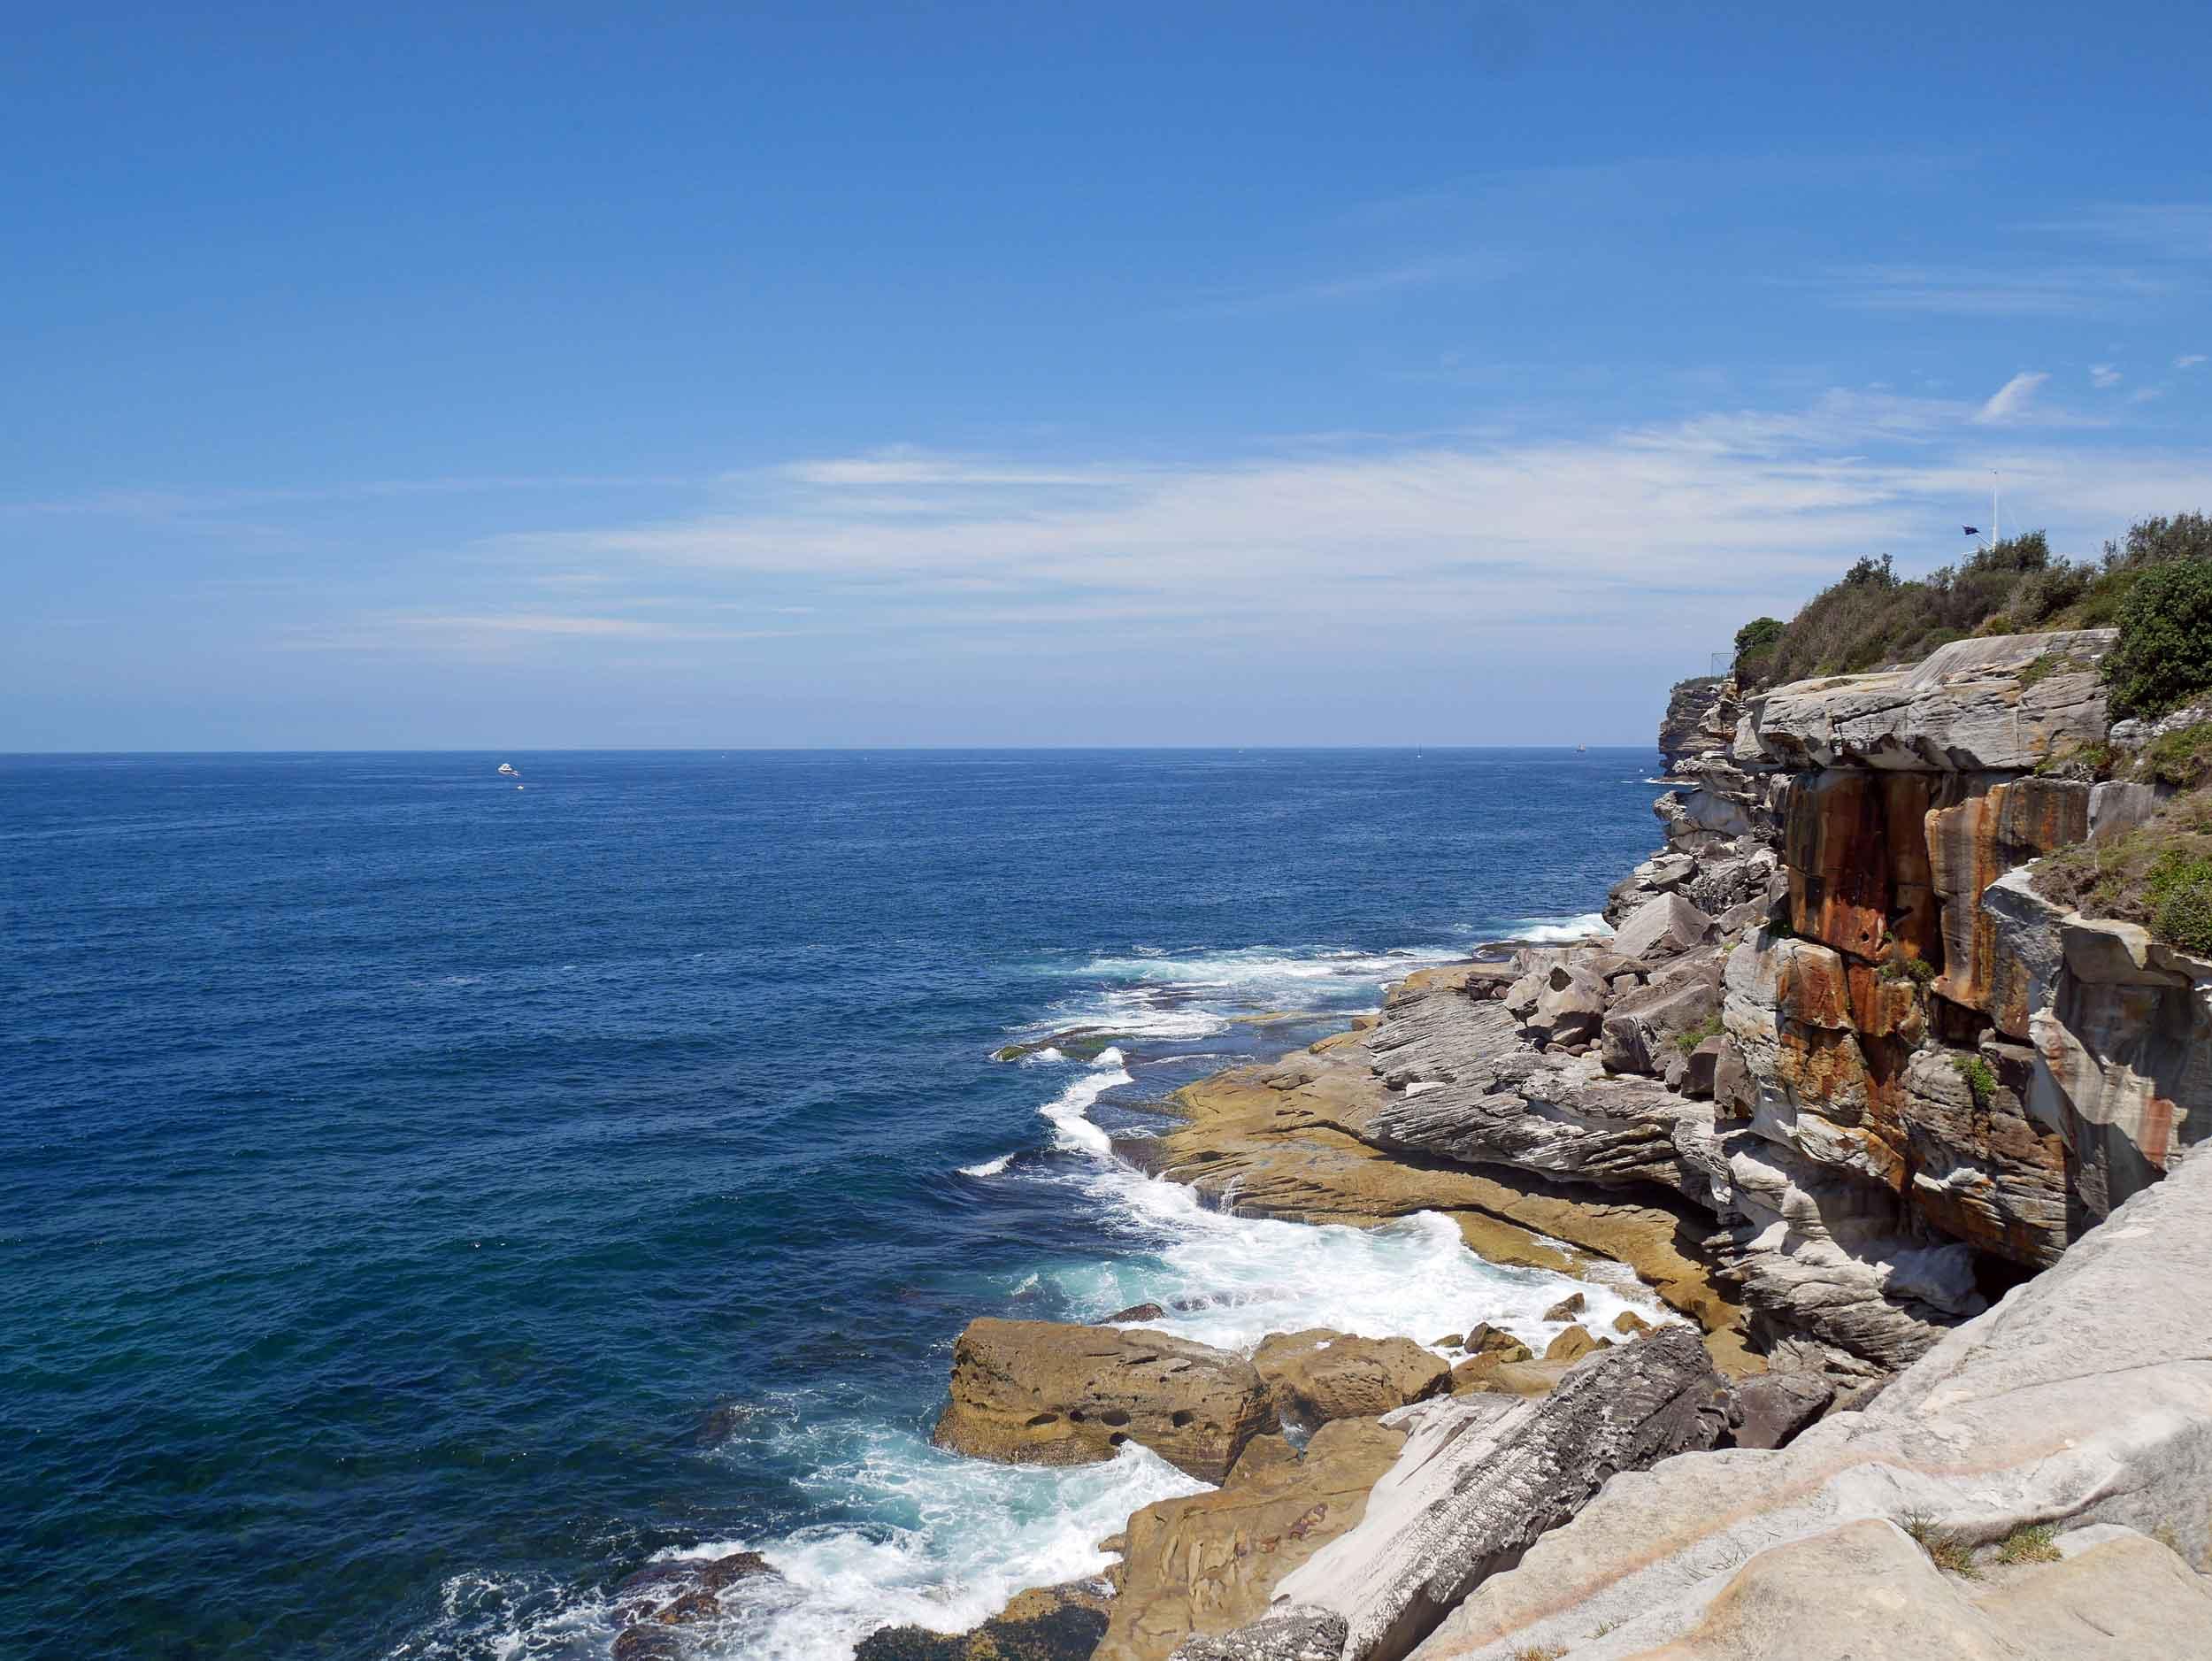 We were once again wow'ed by the awesome, rugged coastline of Australia (Feb 4).